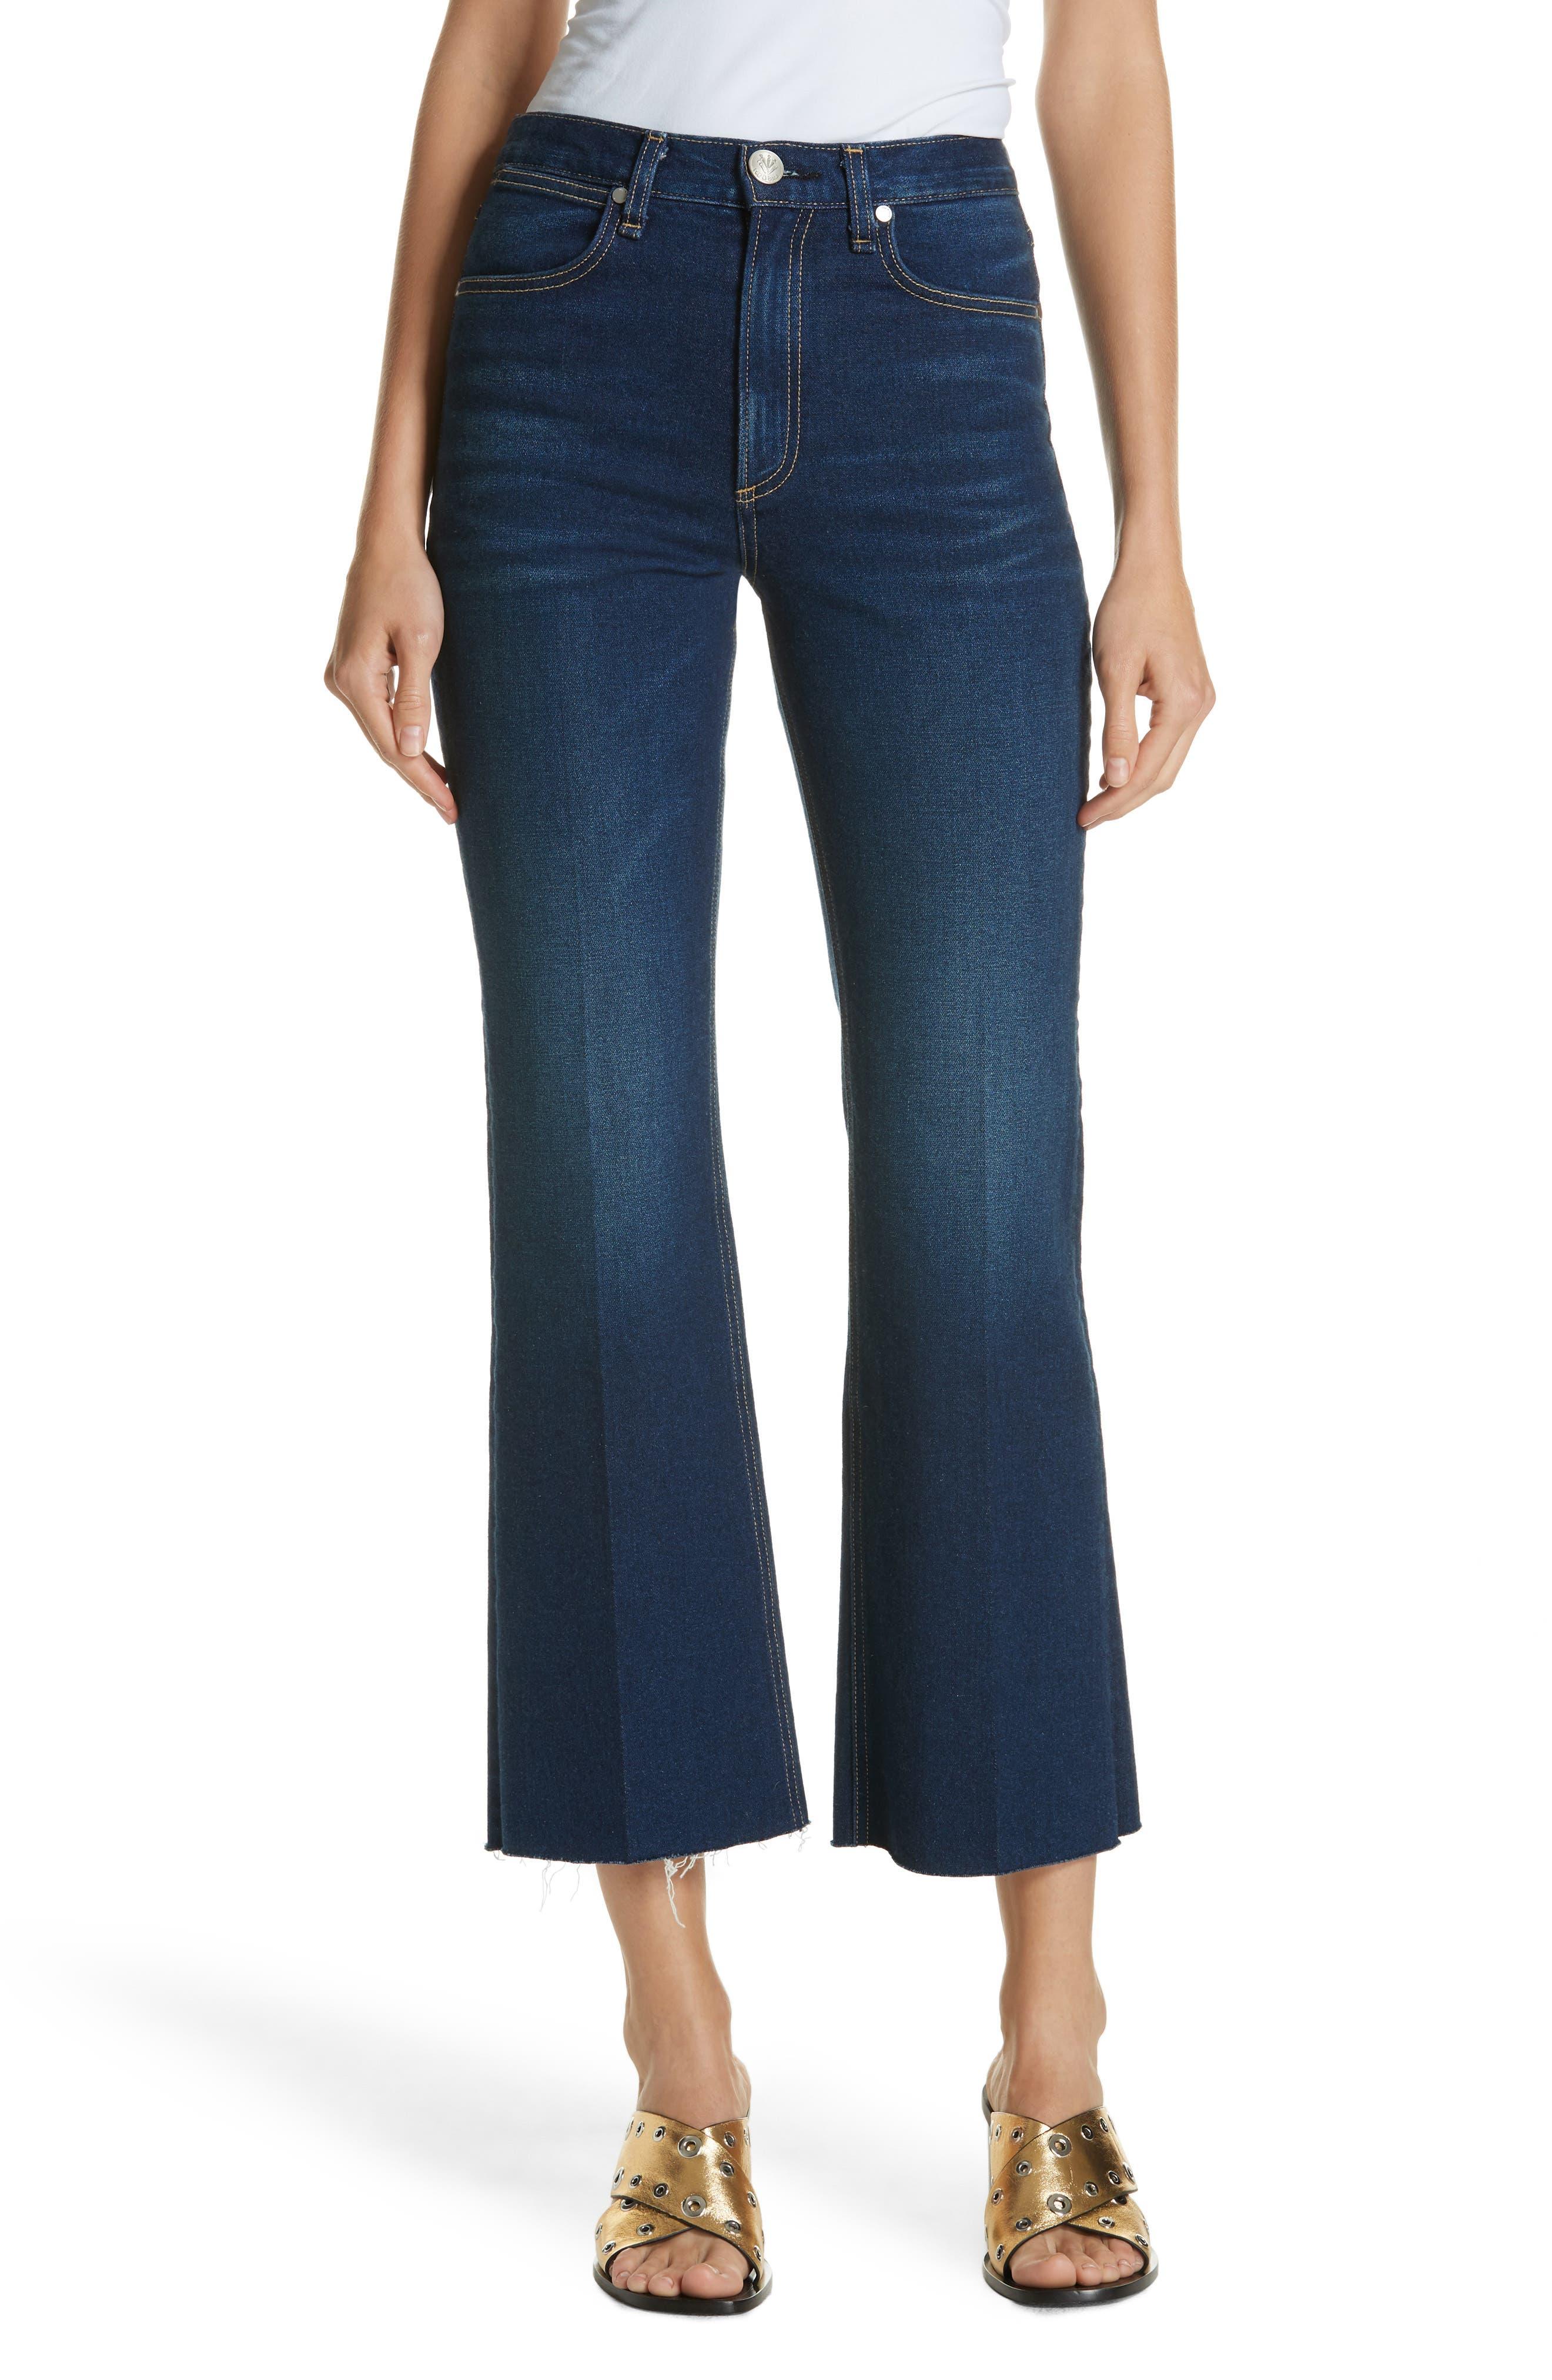 RAG & BONE Justine High Waist Crop Wide Leg Jeans, Main, color, 410